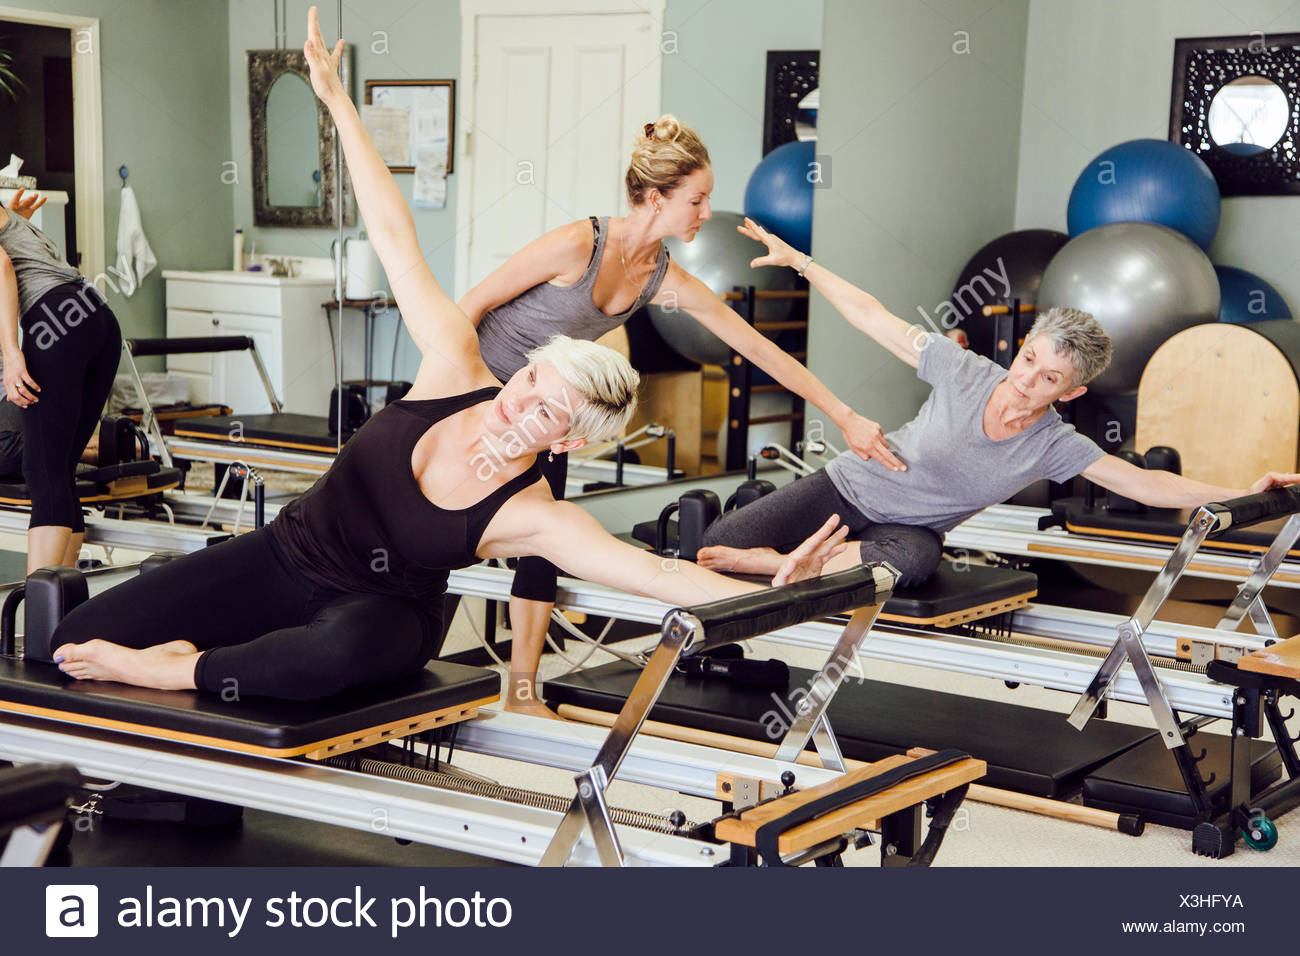 Women in gym using pilates reformer - Stock Image